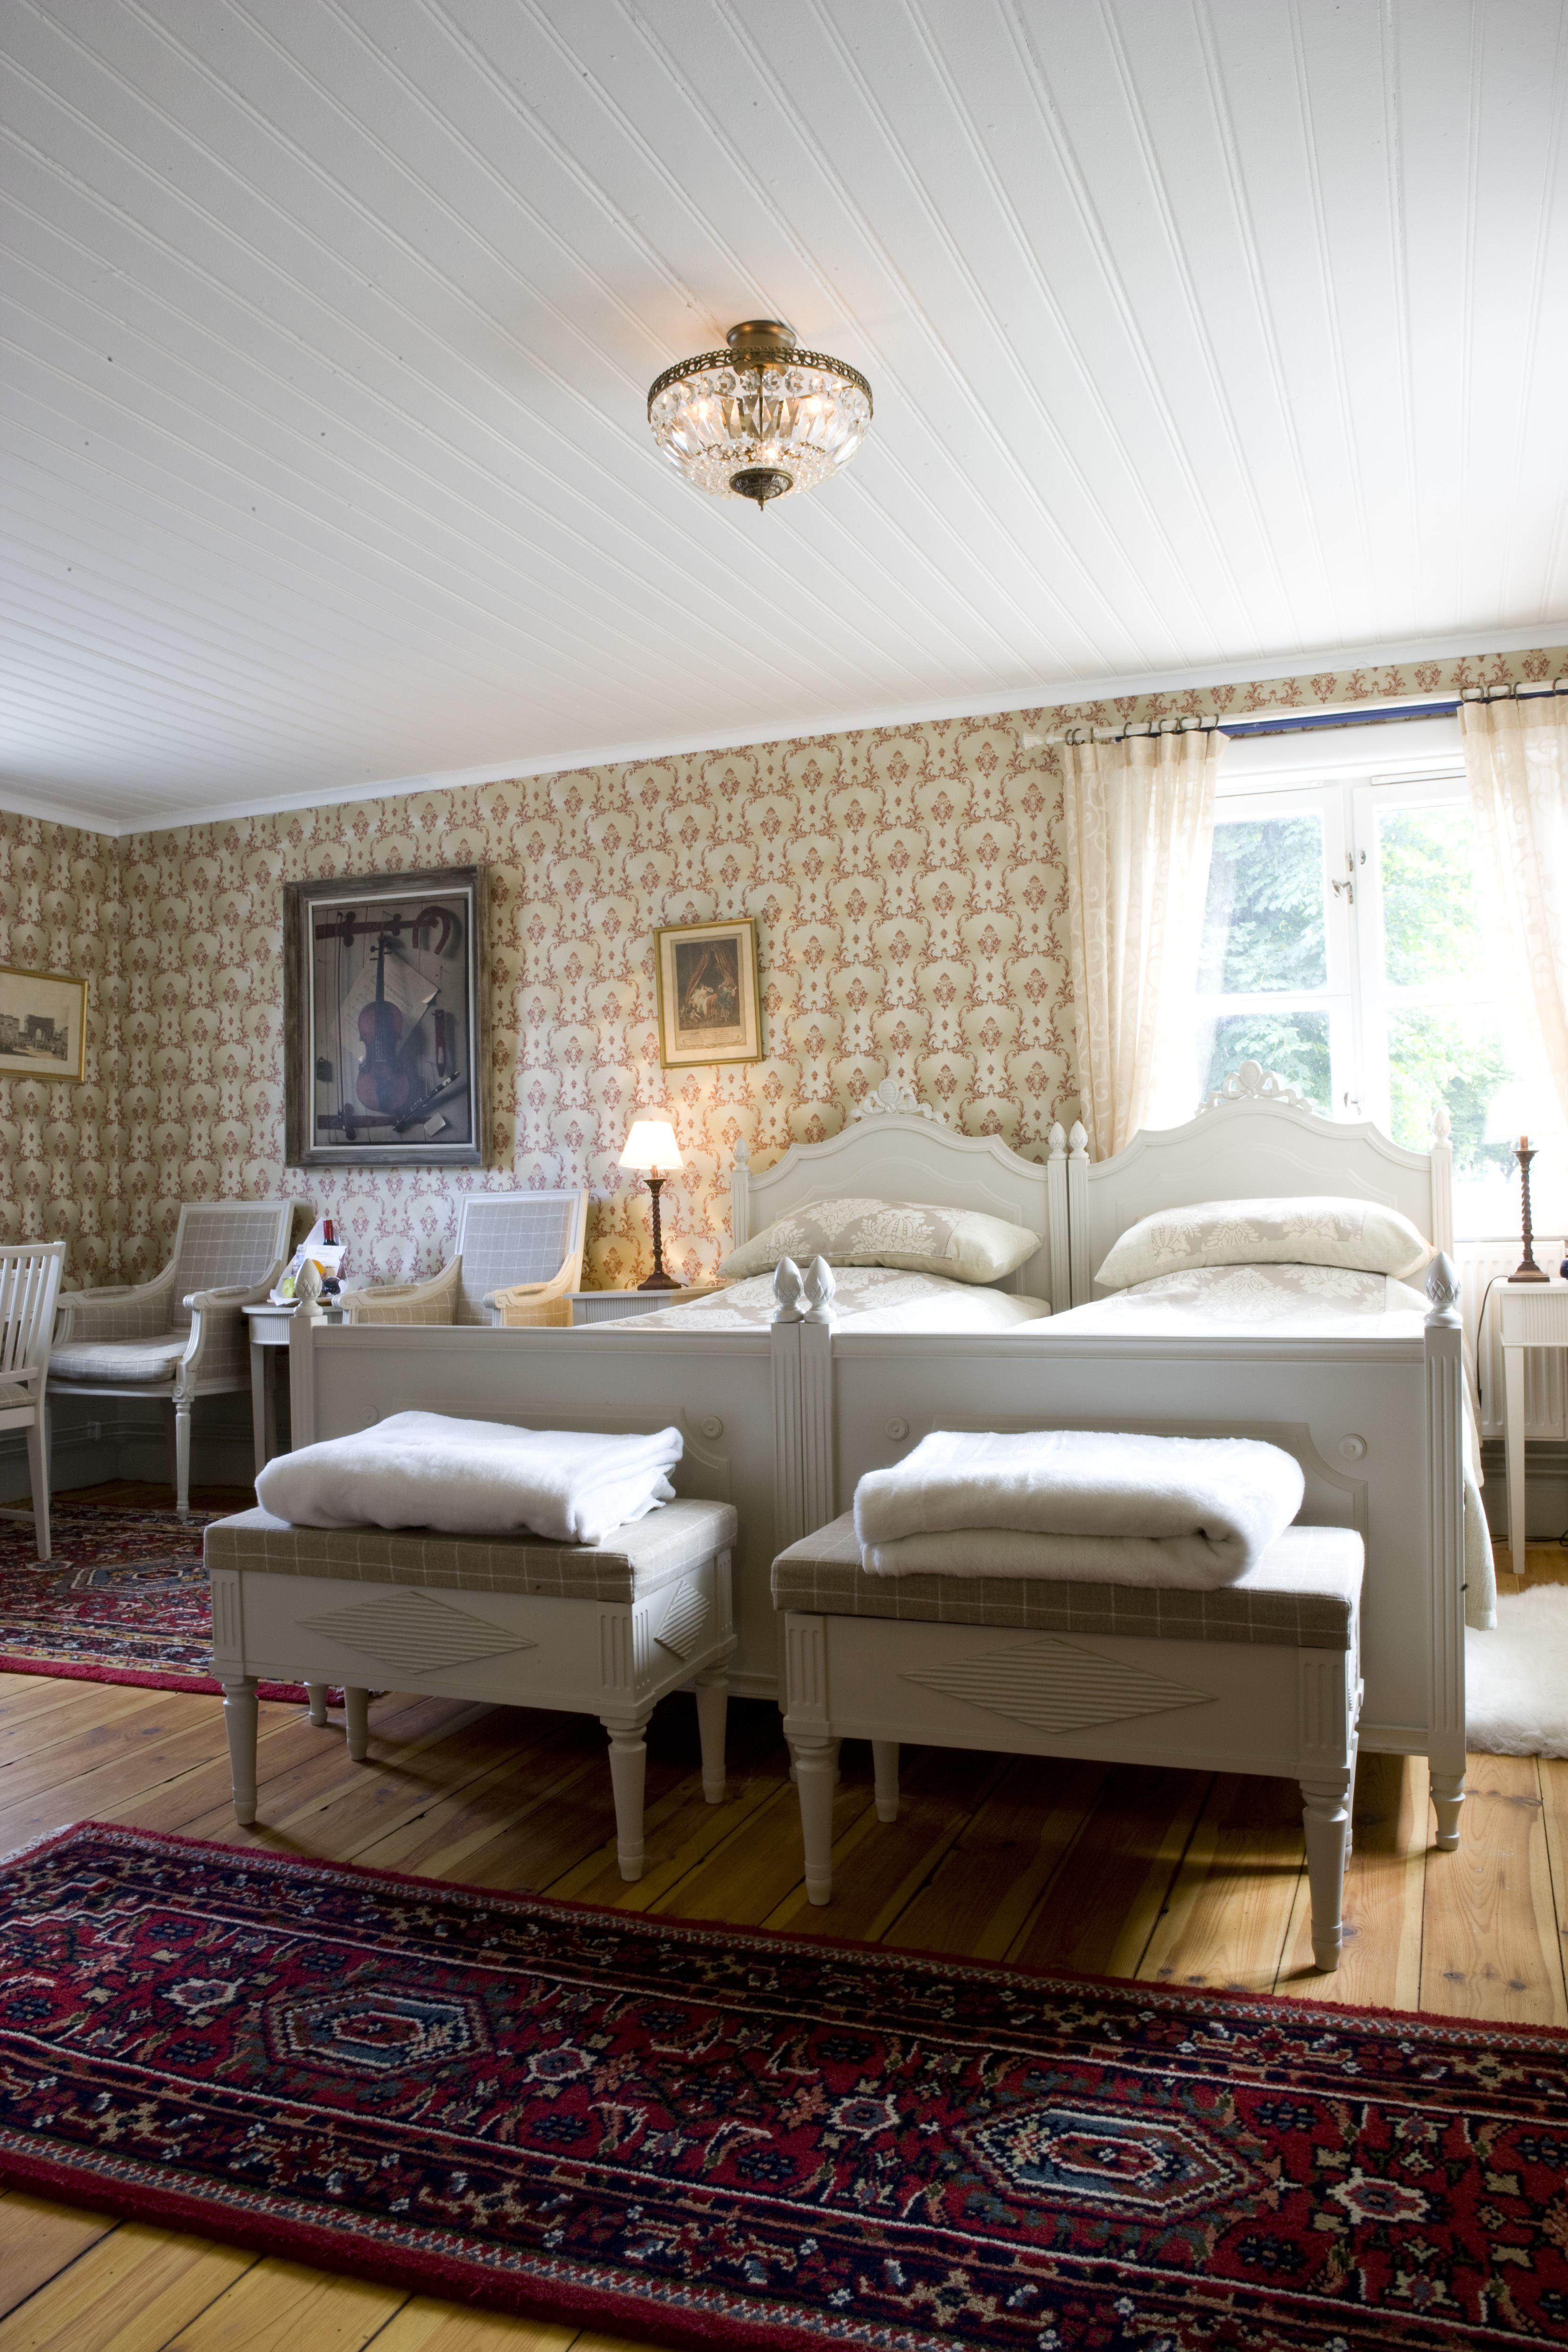 Vadstena Klosterhotel